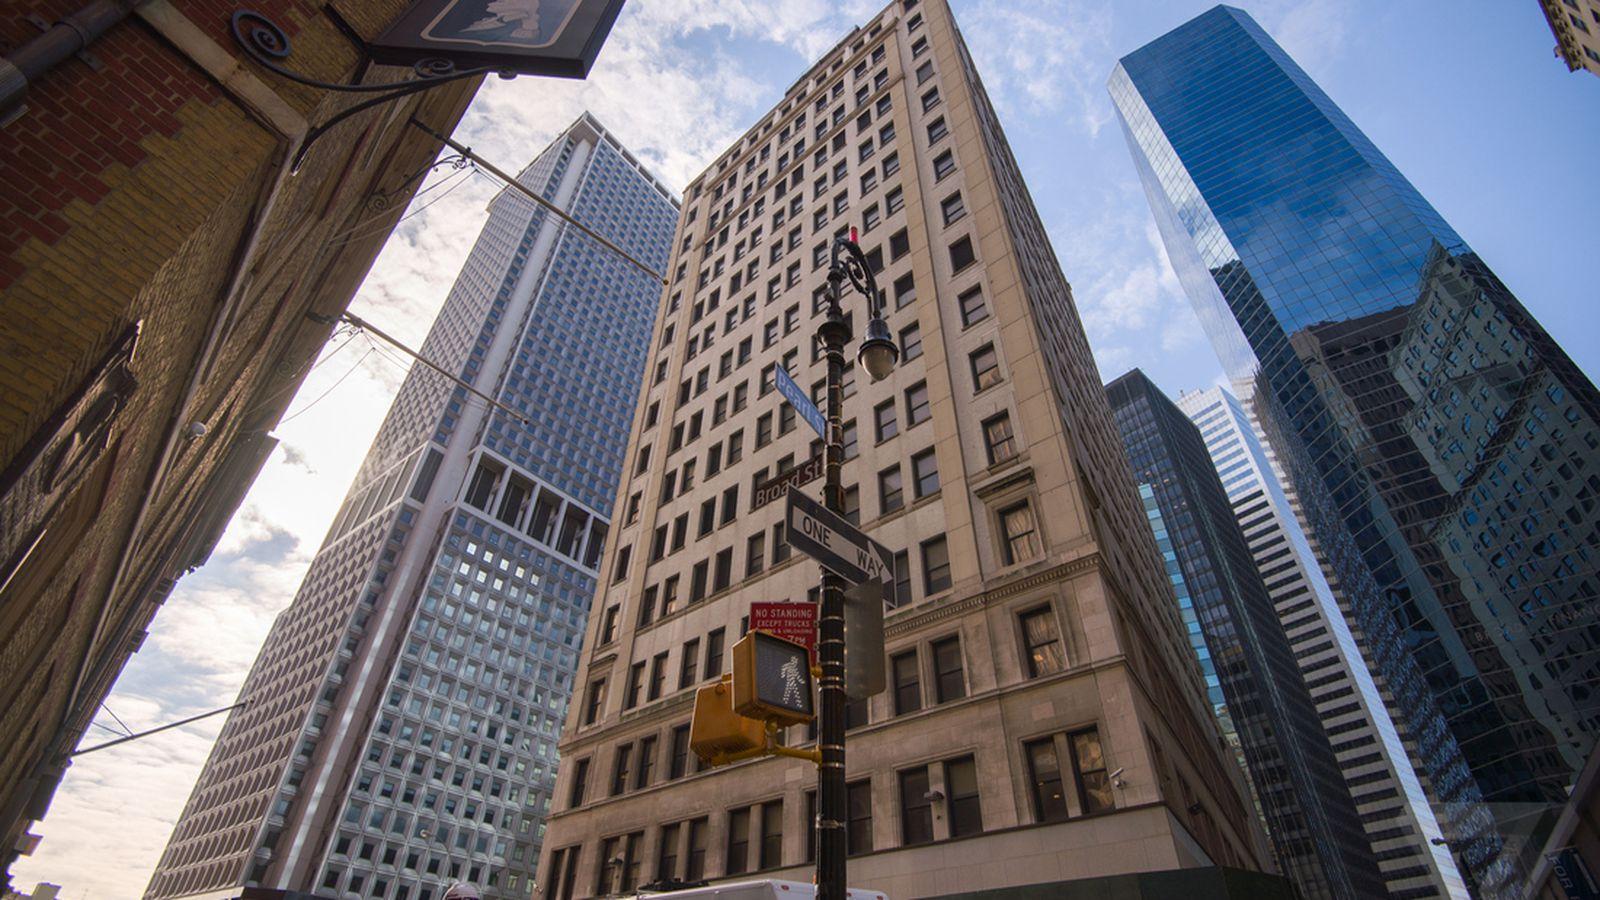 Verizon S Broad Street Central Office In Lower Manhattan